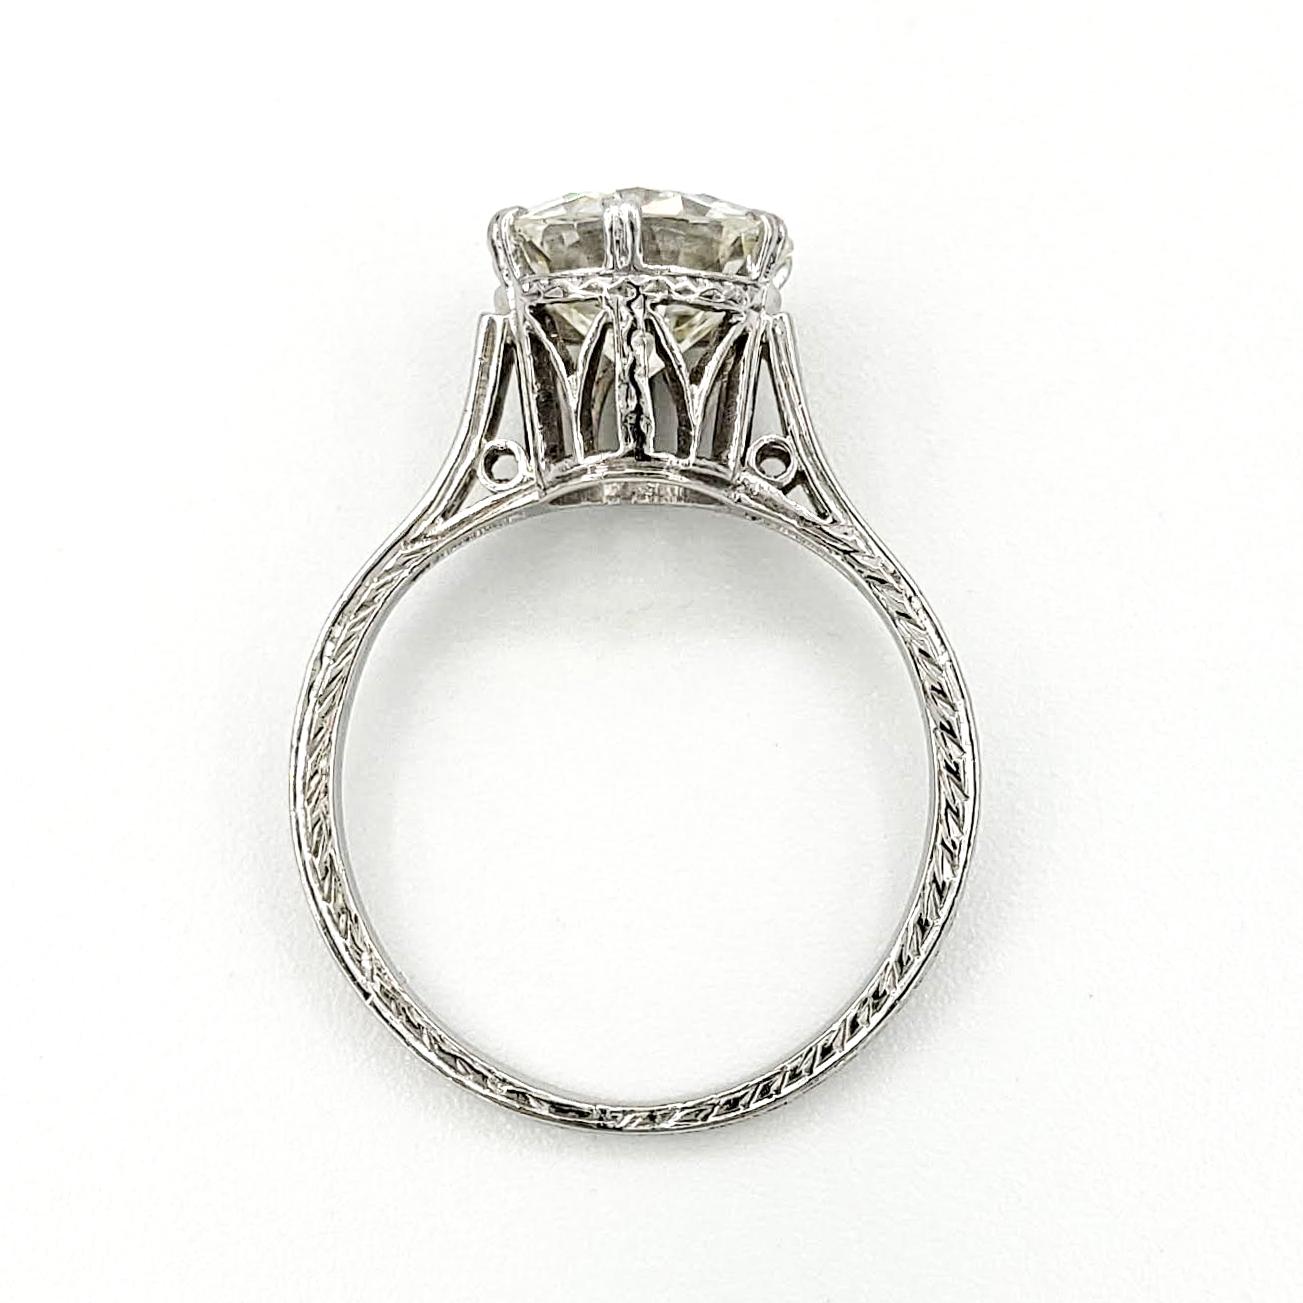 vintage-platinum-engagement-ring-with-1-63-carat-old-european-cut-diamond-egl-k-vs1